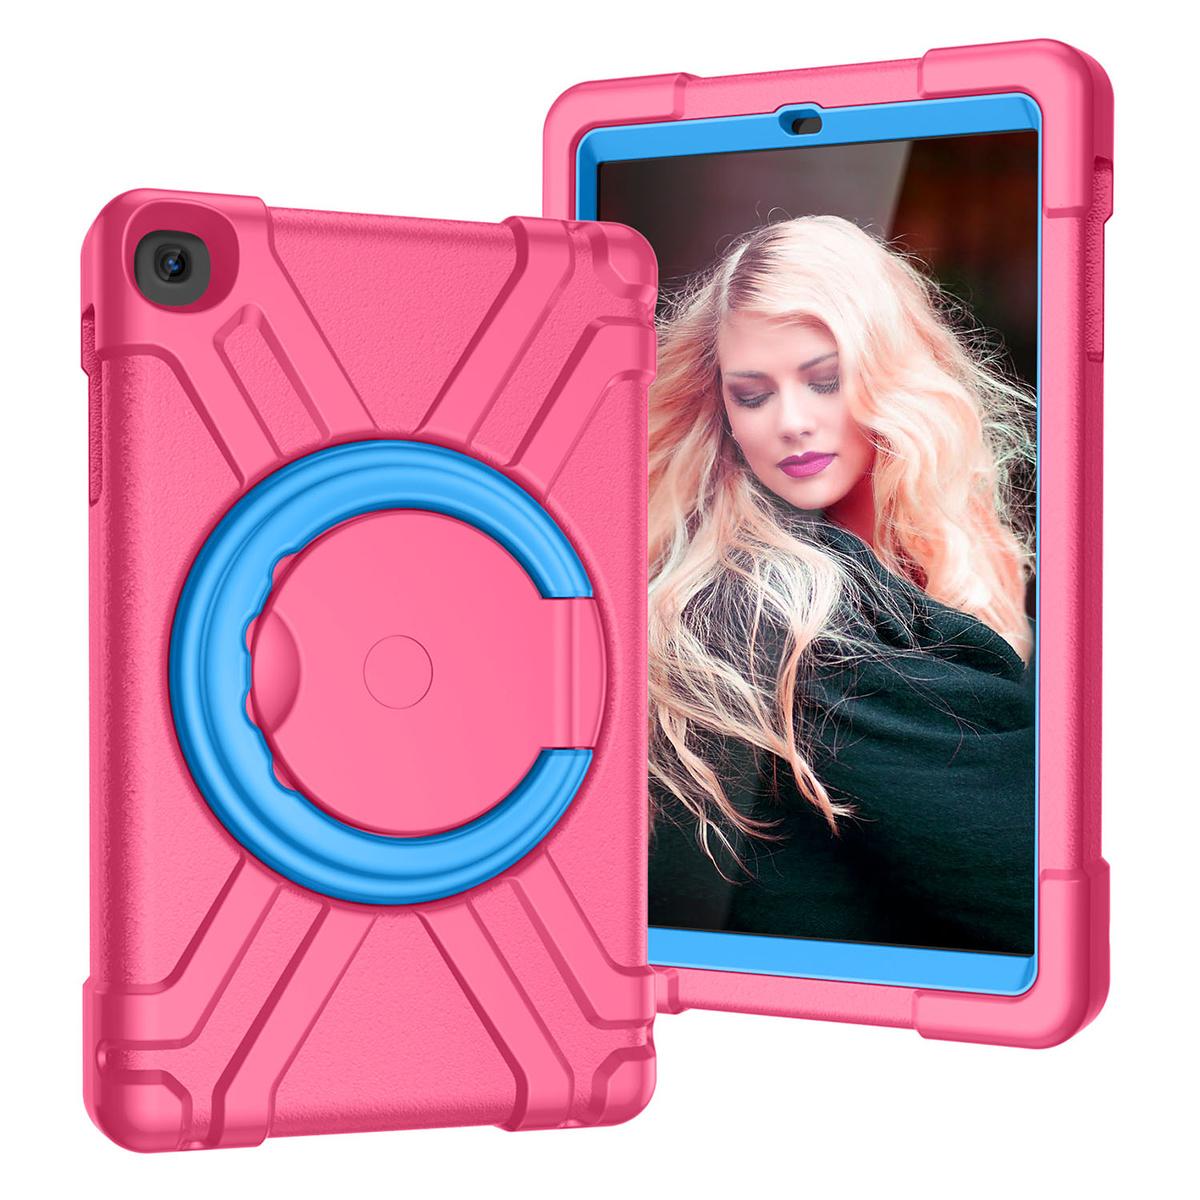 Barnfodral, Samsung Tab A 10.1 (2019), rosa/blå